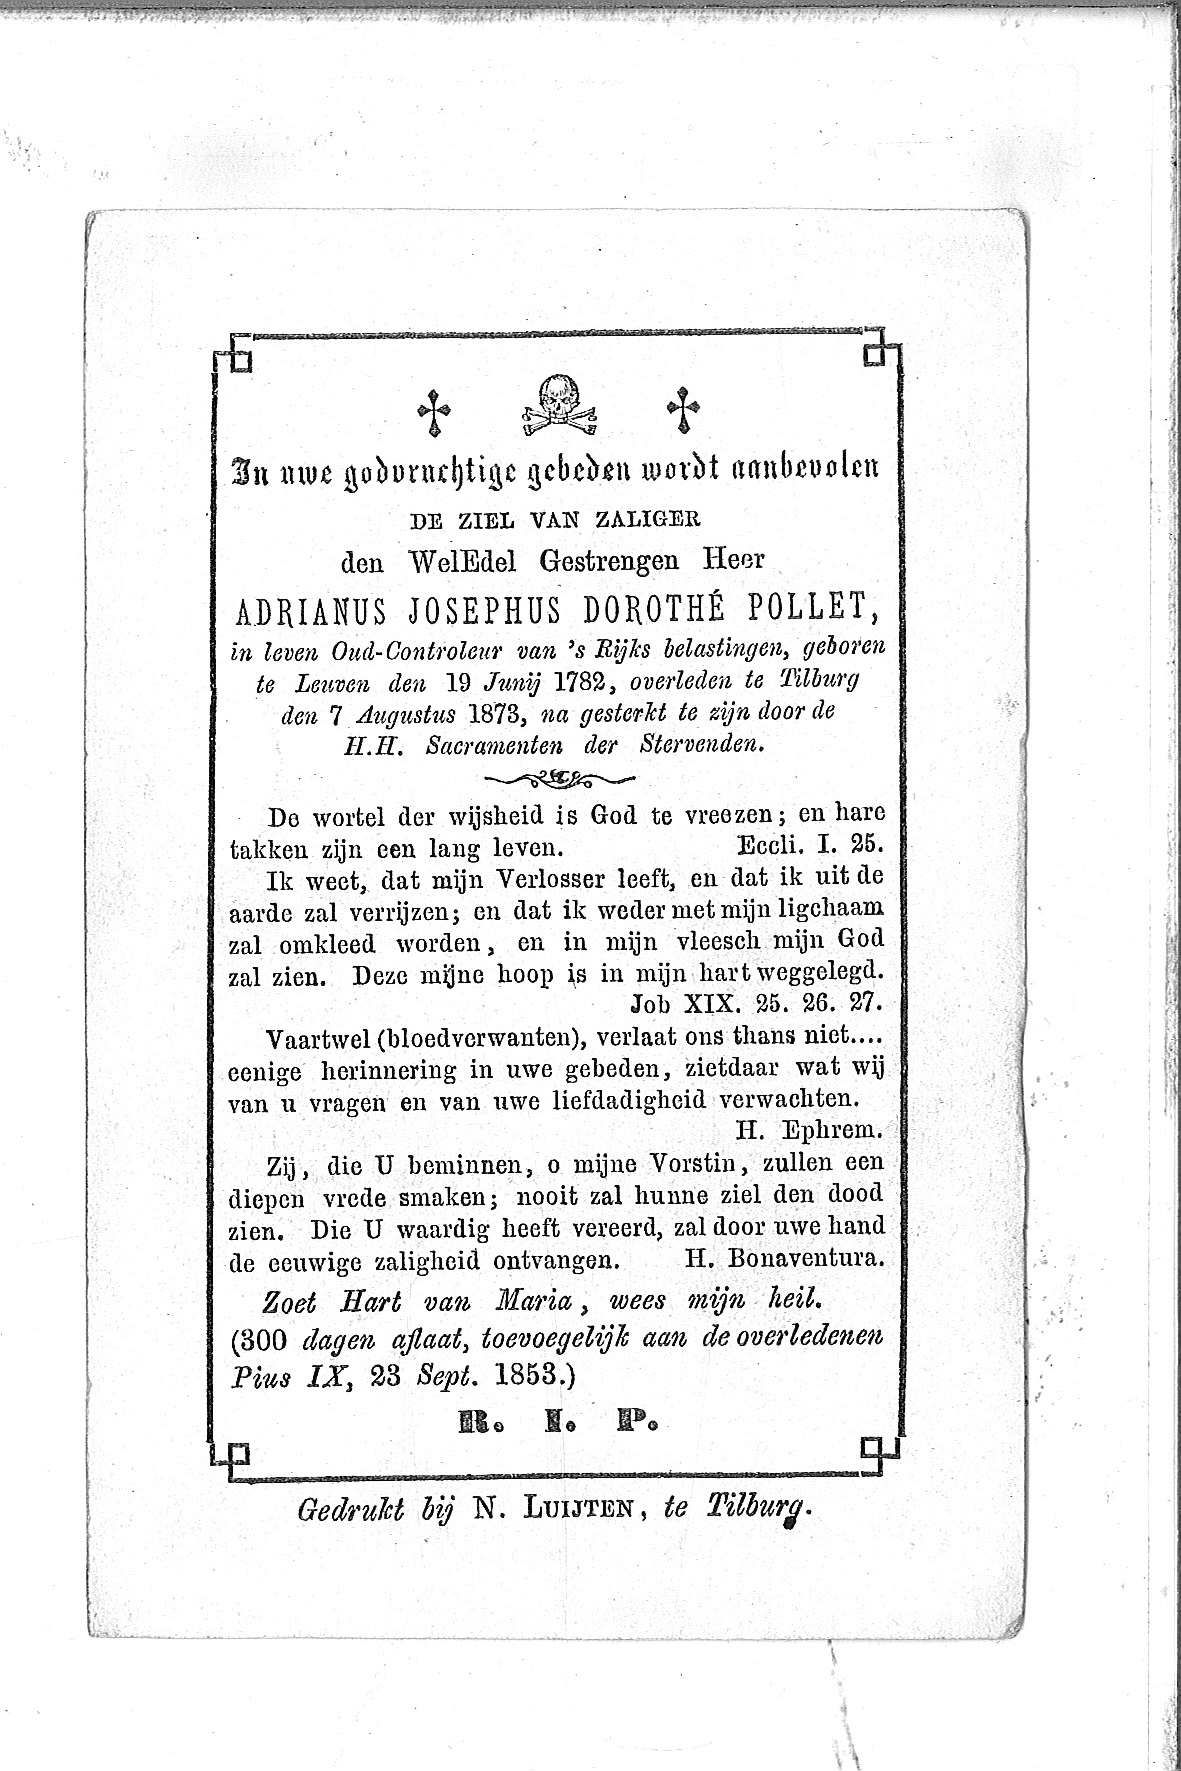 Adrianus-Josephus-Dorothé(1873)20140702142911_00006.jpg